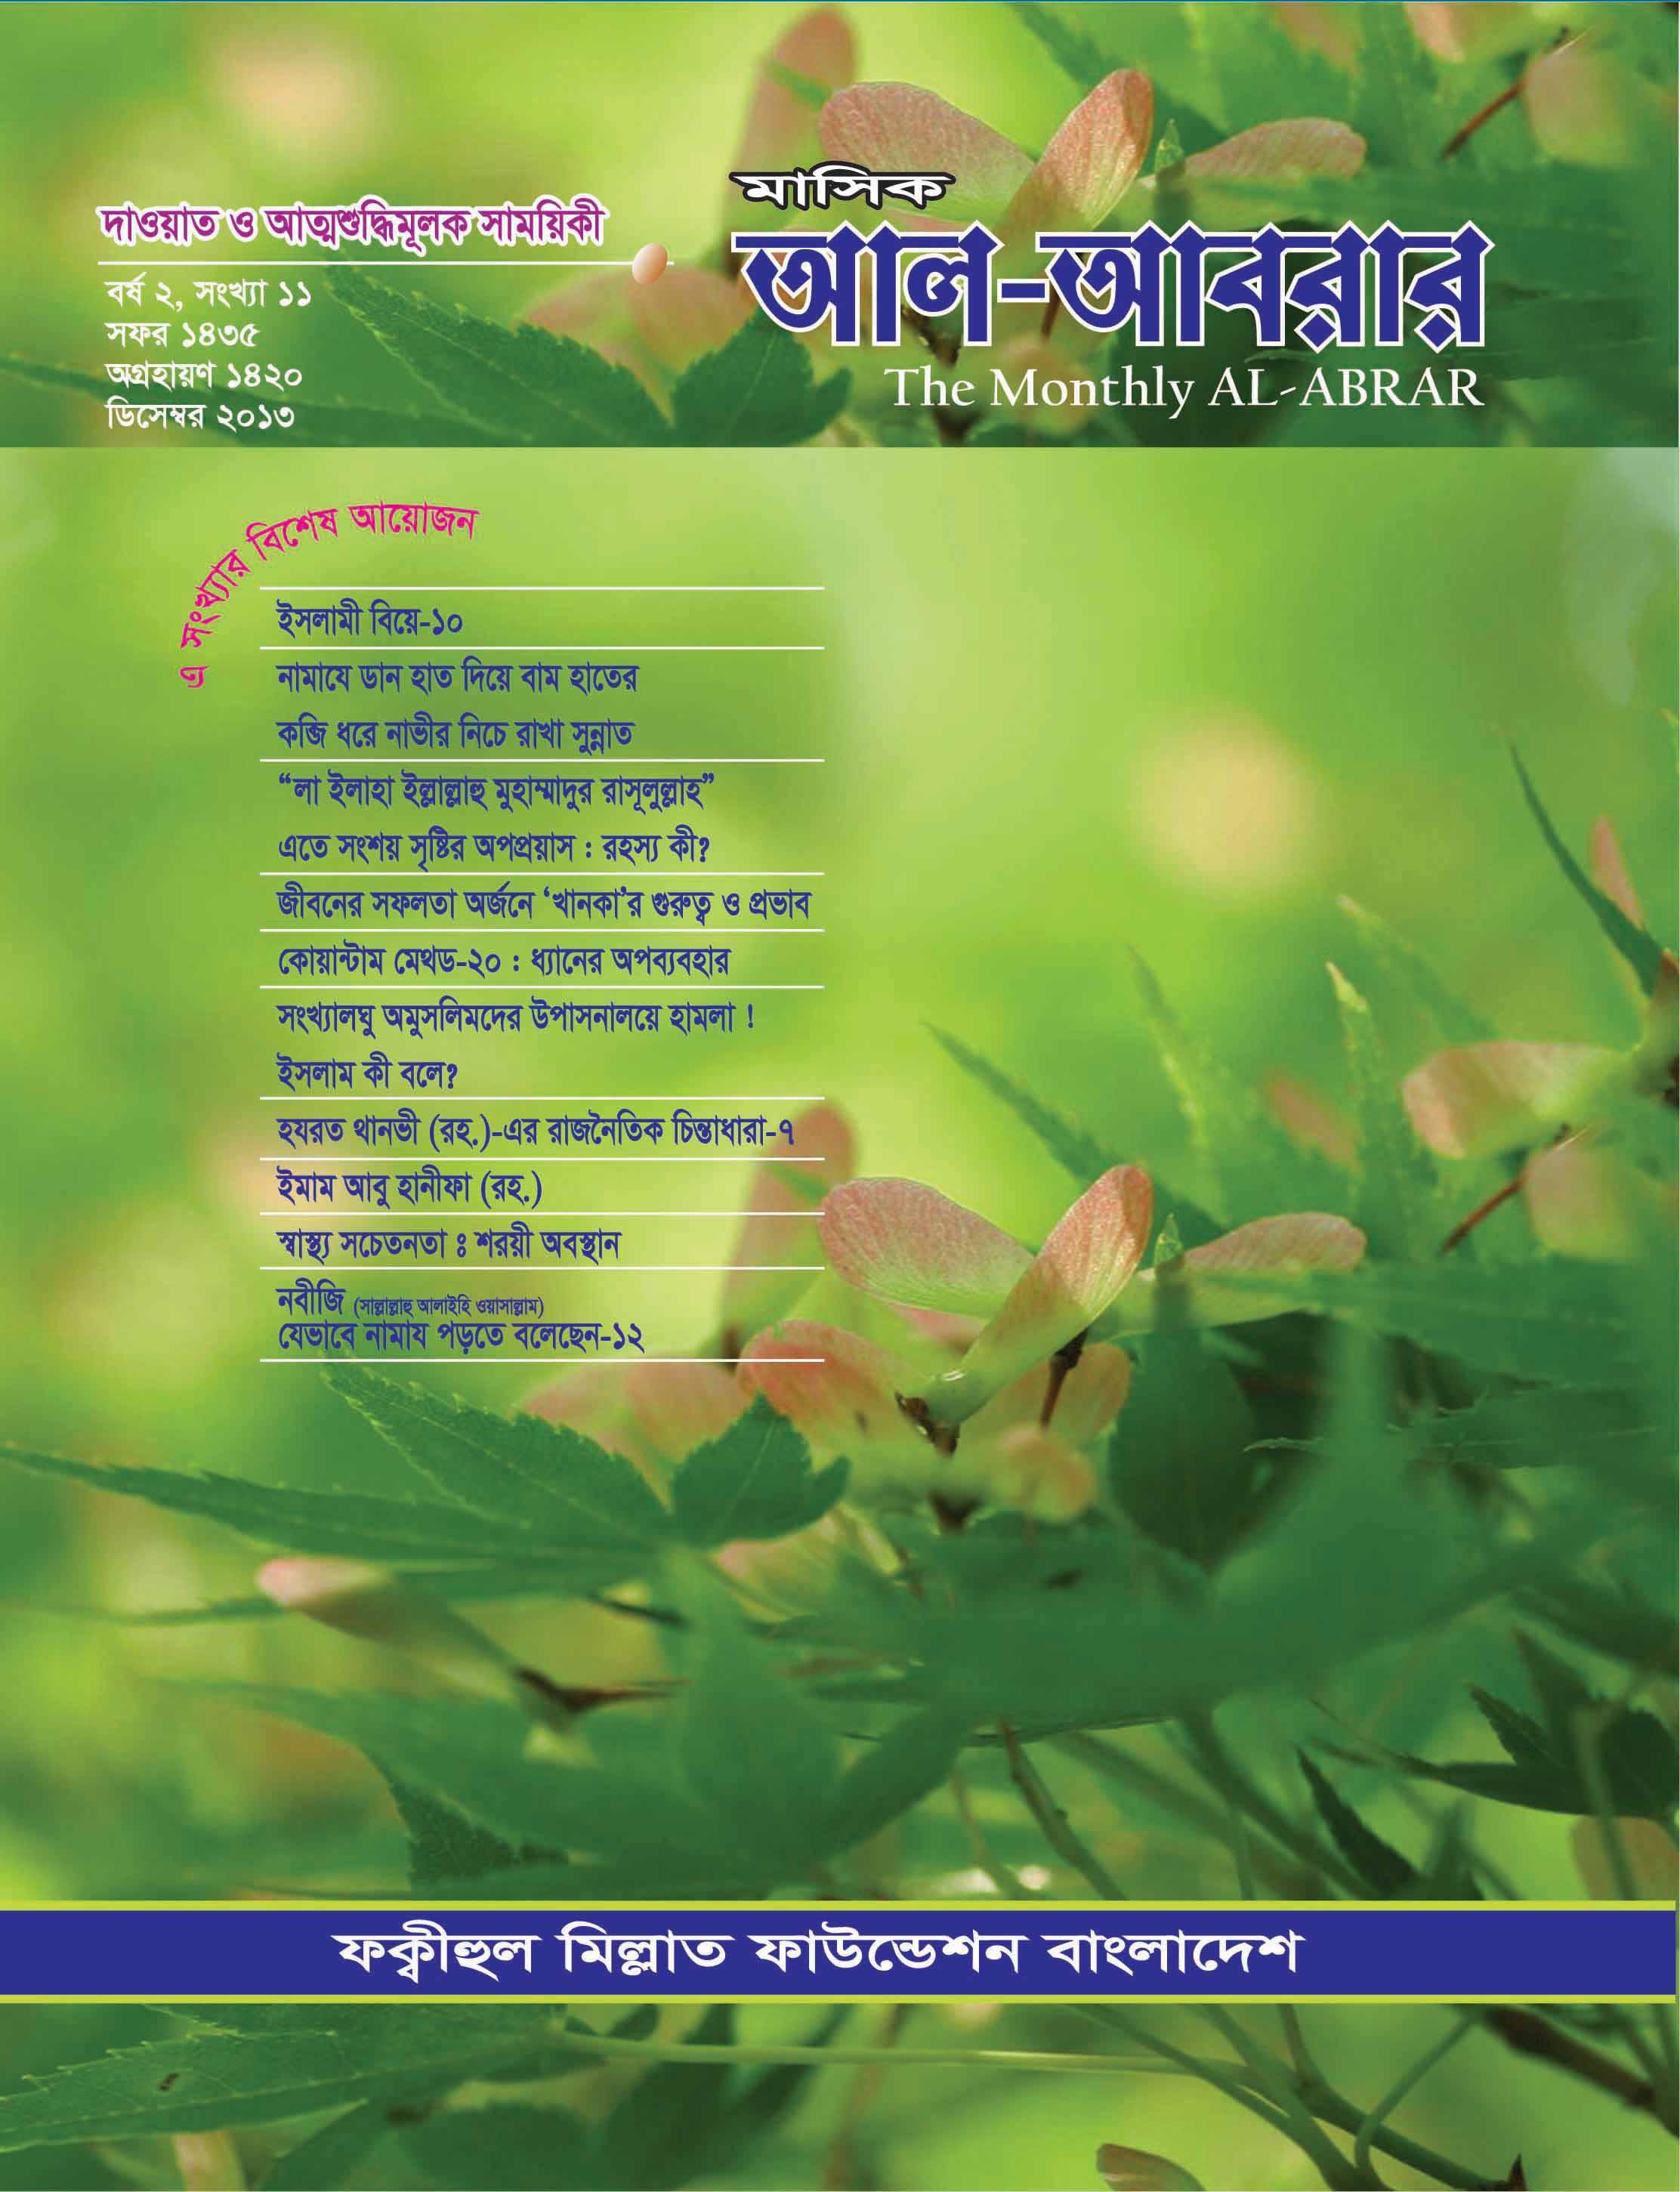 Cover Finel 12-2013-Fainal copy